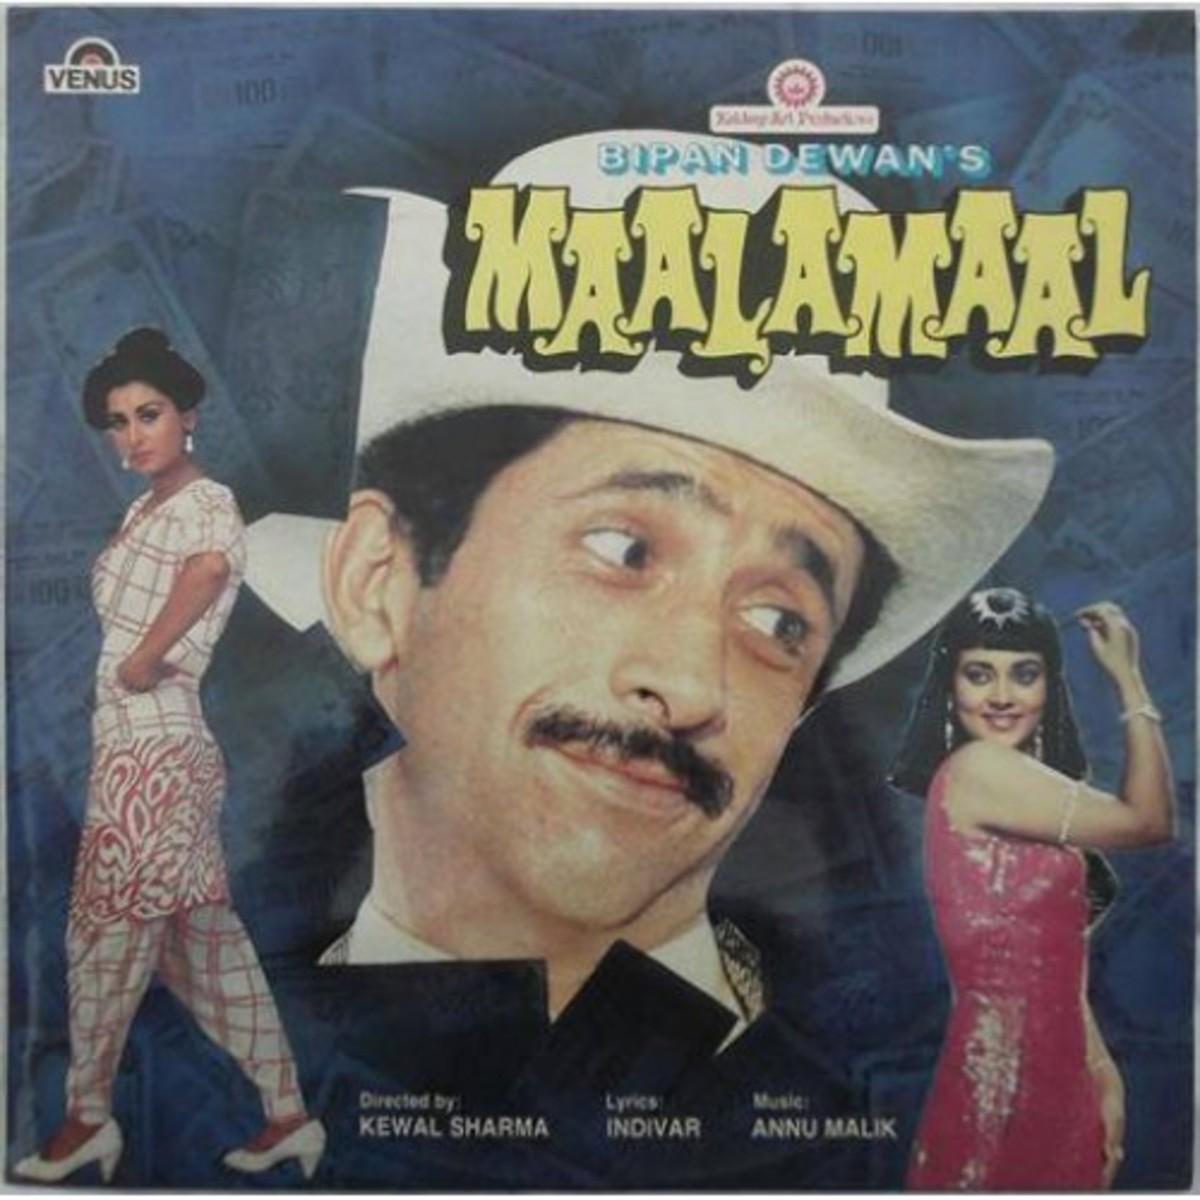 Official cover photo of Maalamaal